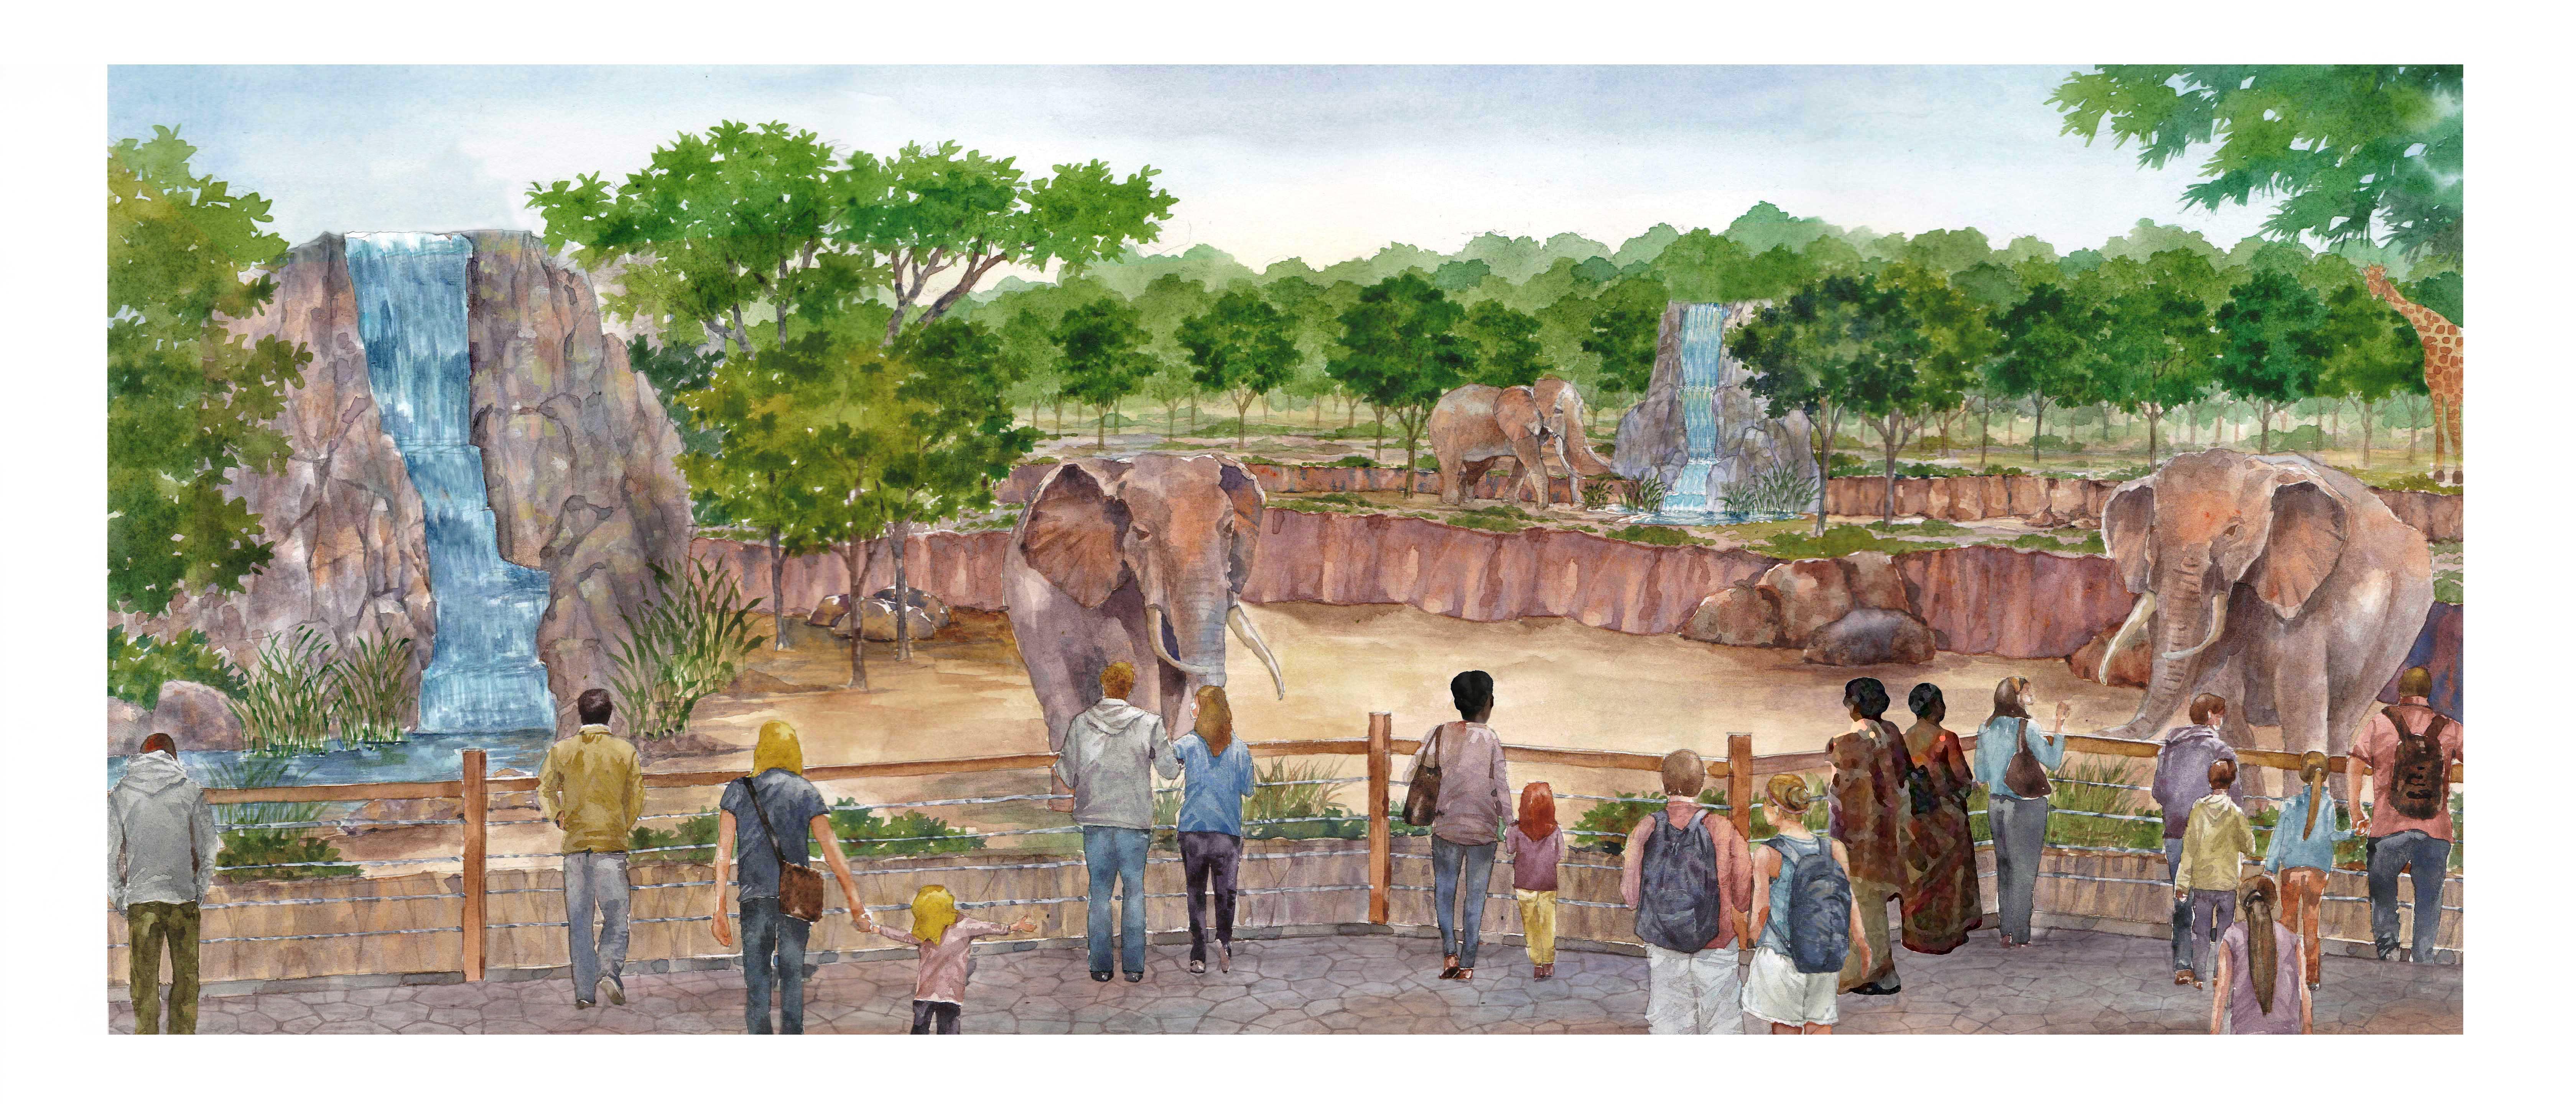 Zoo Atlanta: More Than a Popular Atlanta Attraction